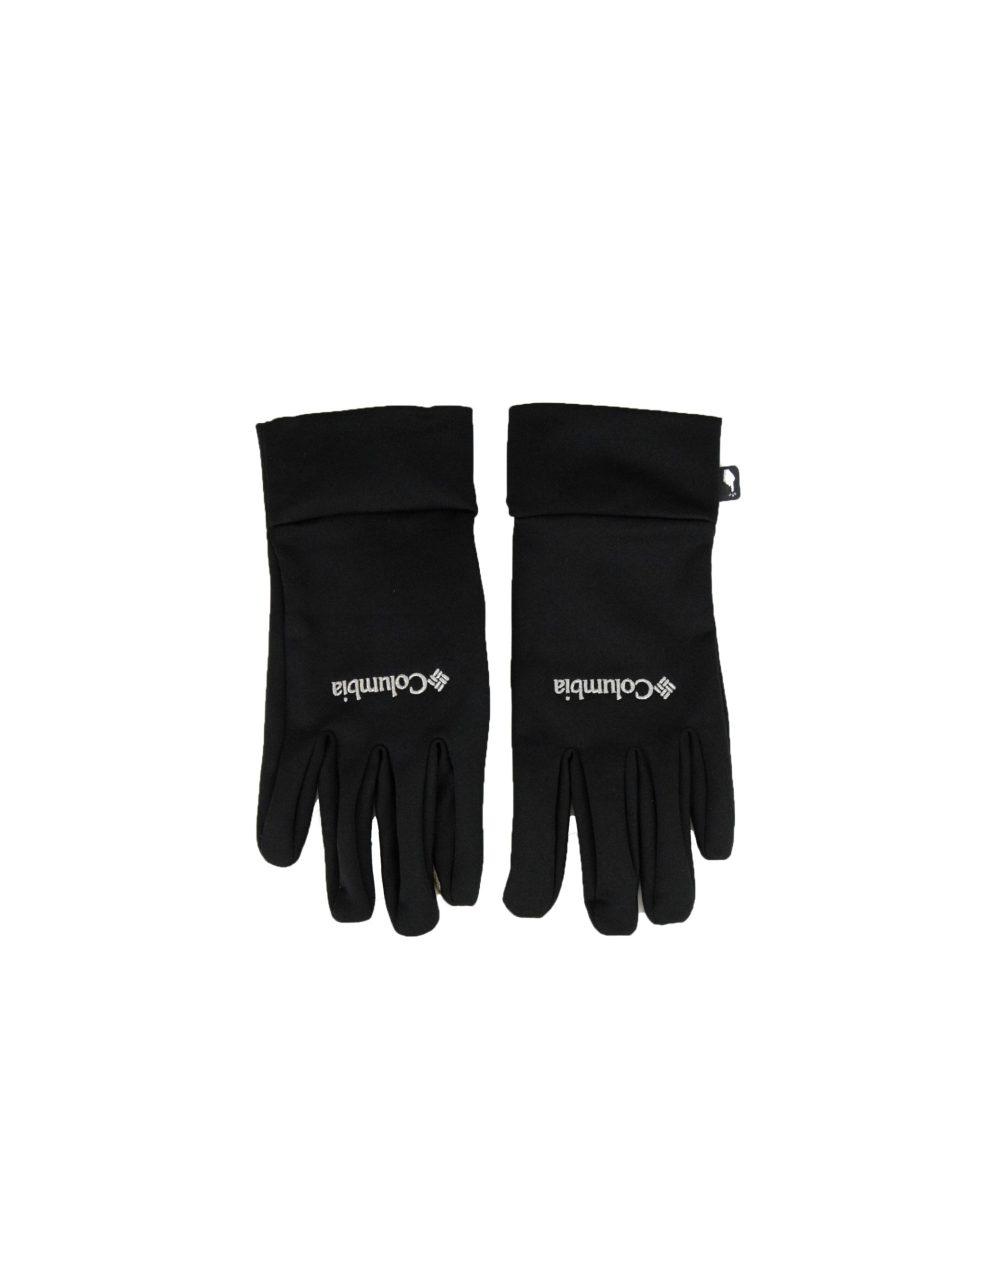 Columbia Omni-Heat Touch Glove Liner (SU1022-010) Black